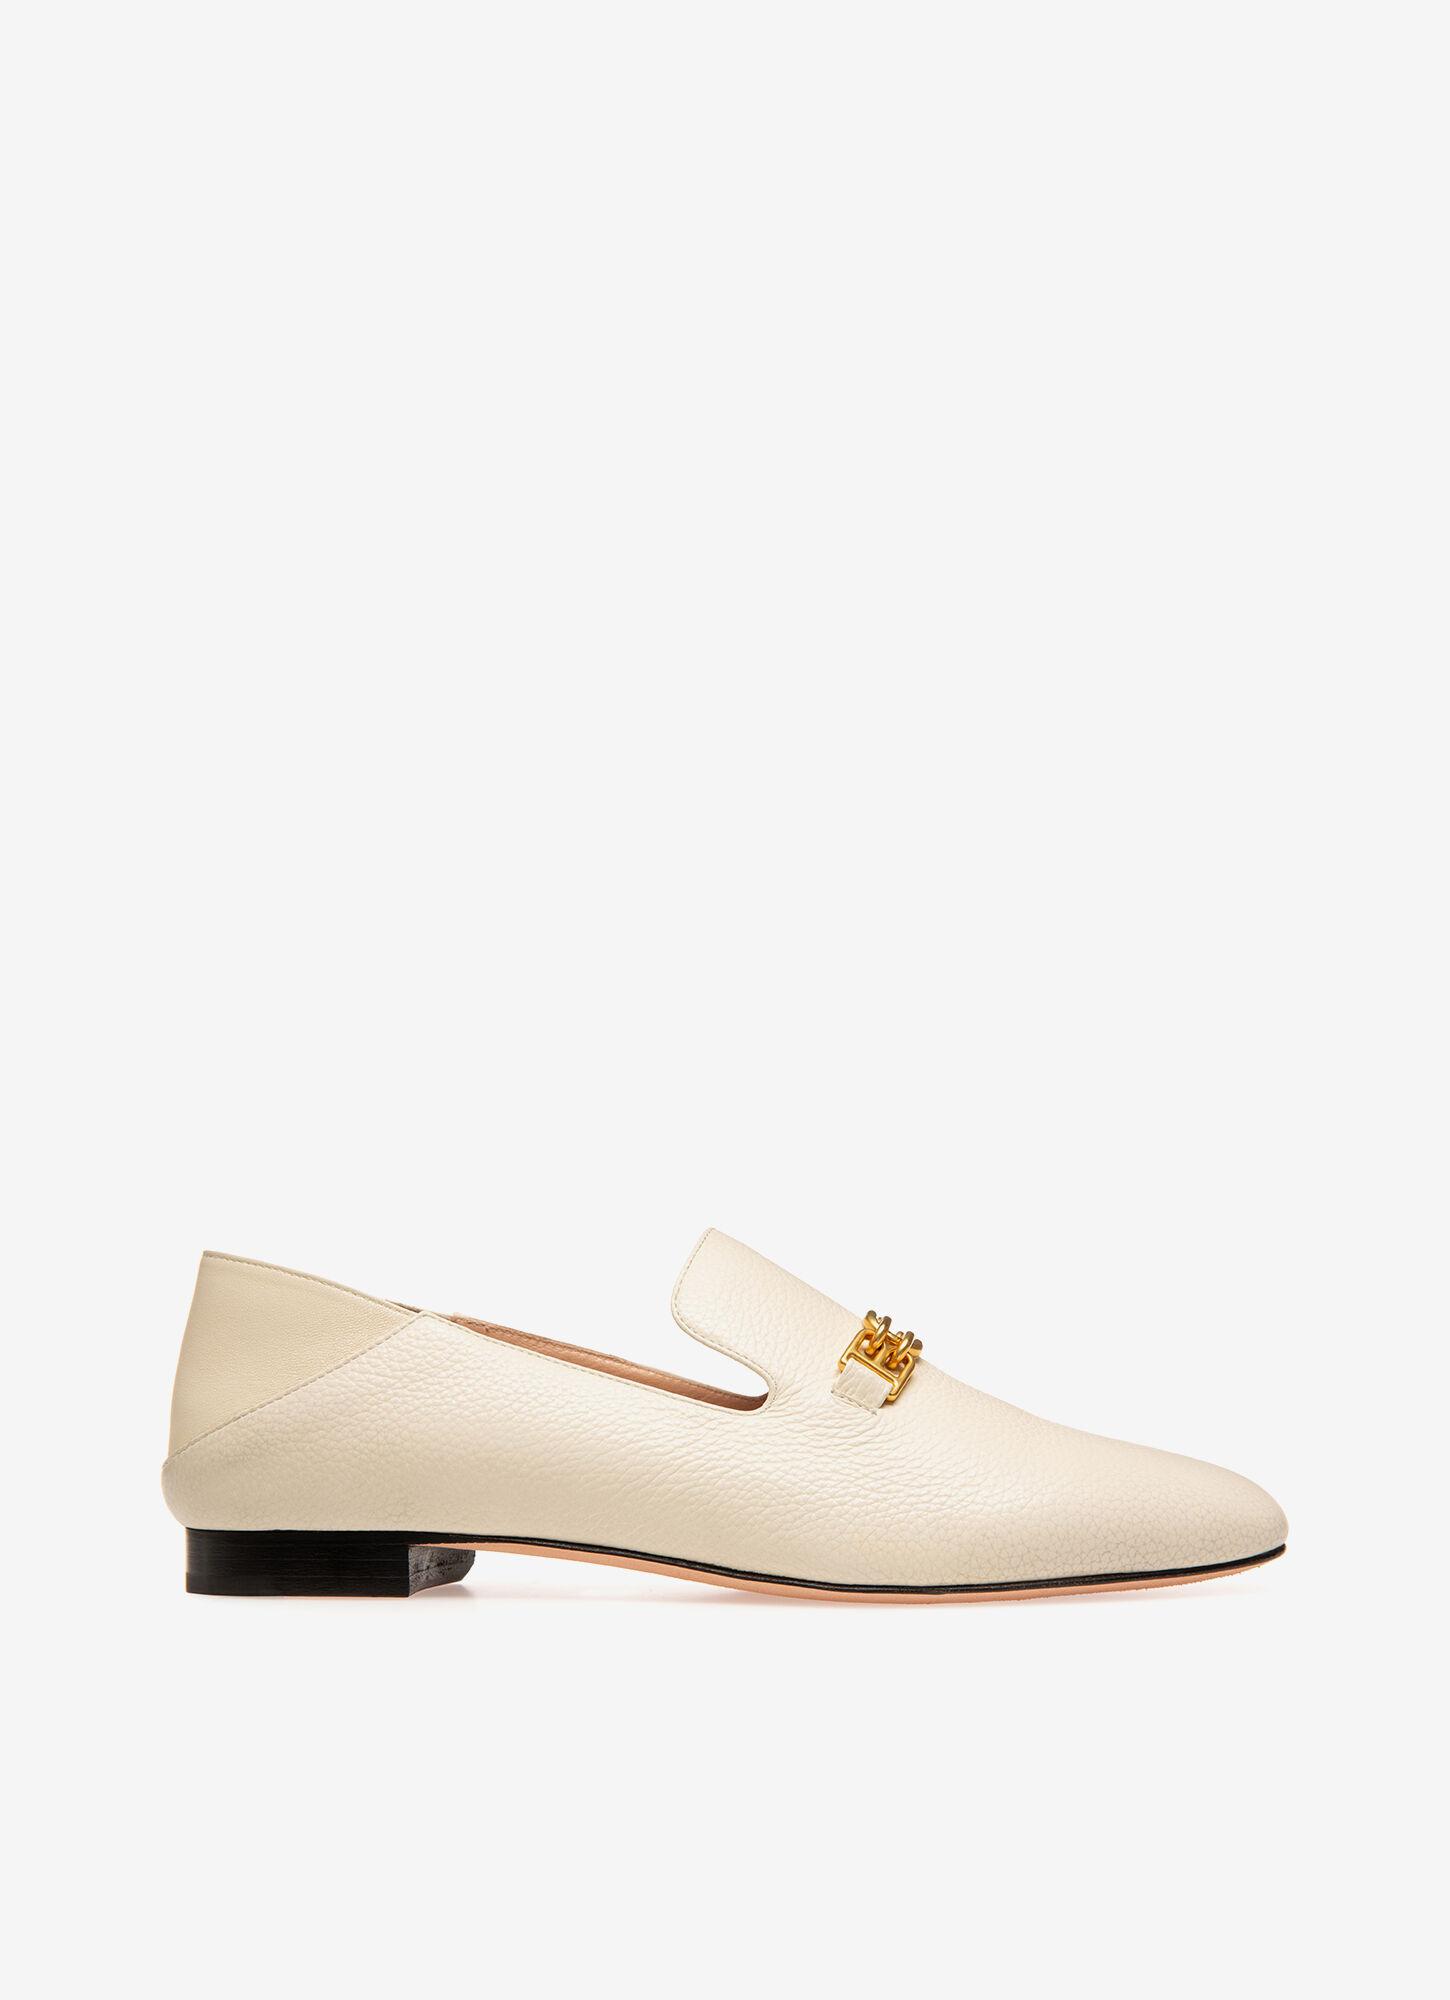 Darcie| Womens Loafers | Bone Leather